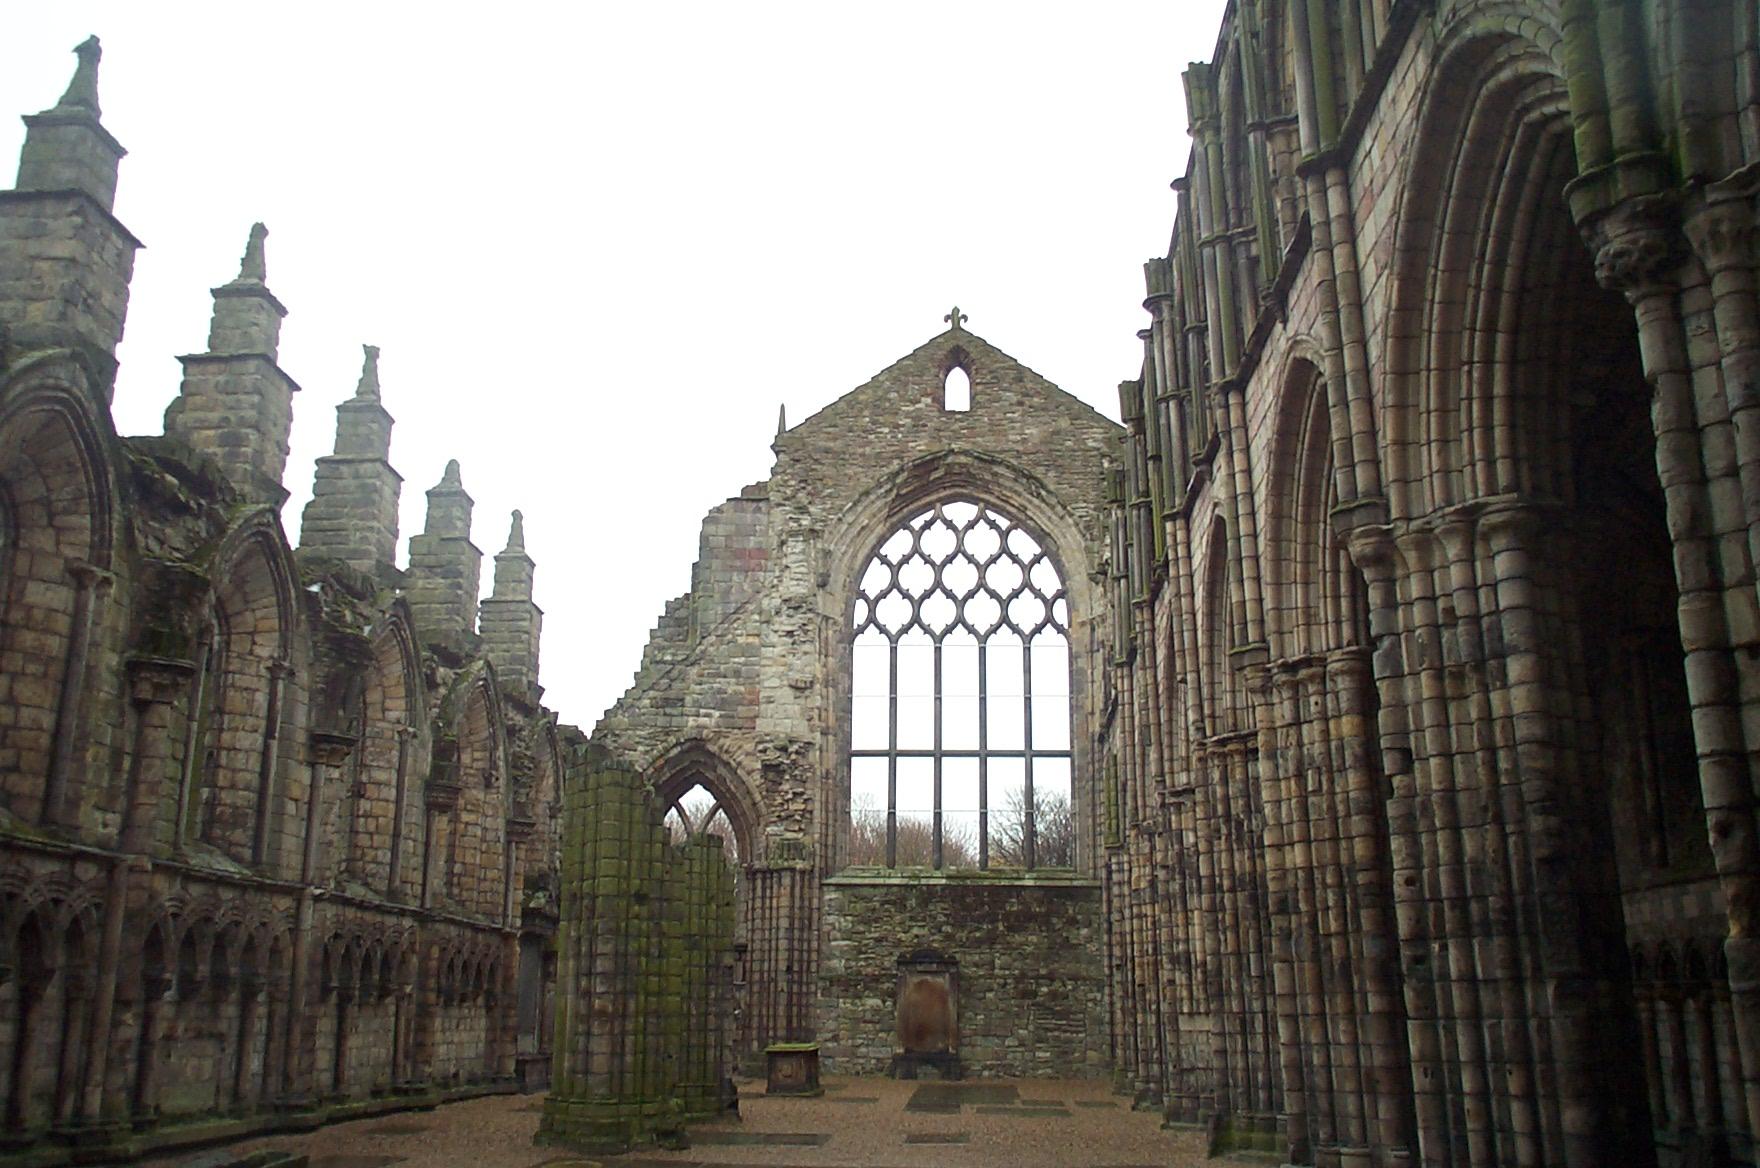 File:Holyrood Abbey ruin 200411.jpg - Wikimedia Commons